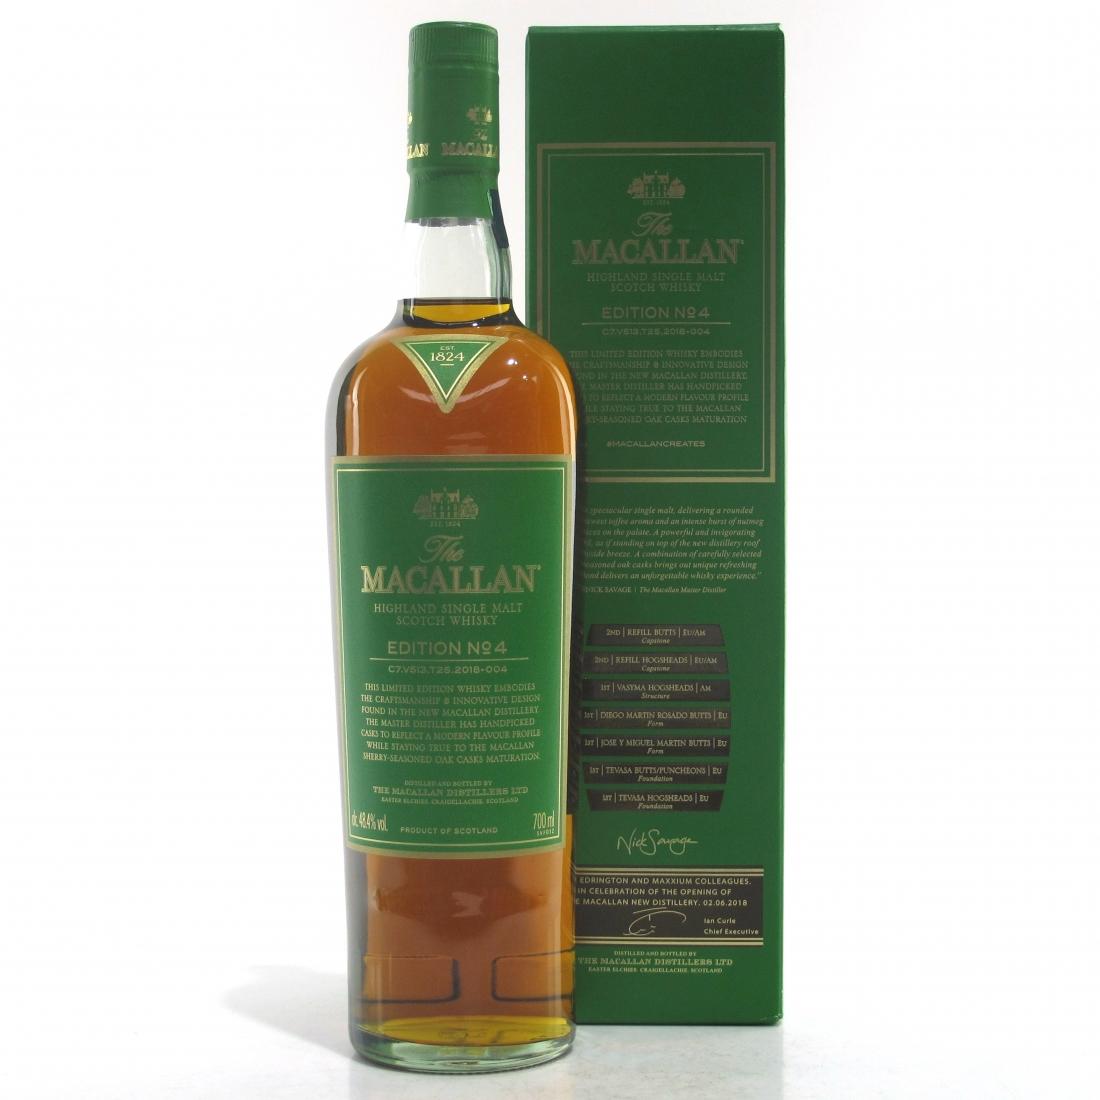 Macallan Edition No.4 / Edrington & Maxxium Staff